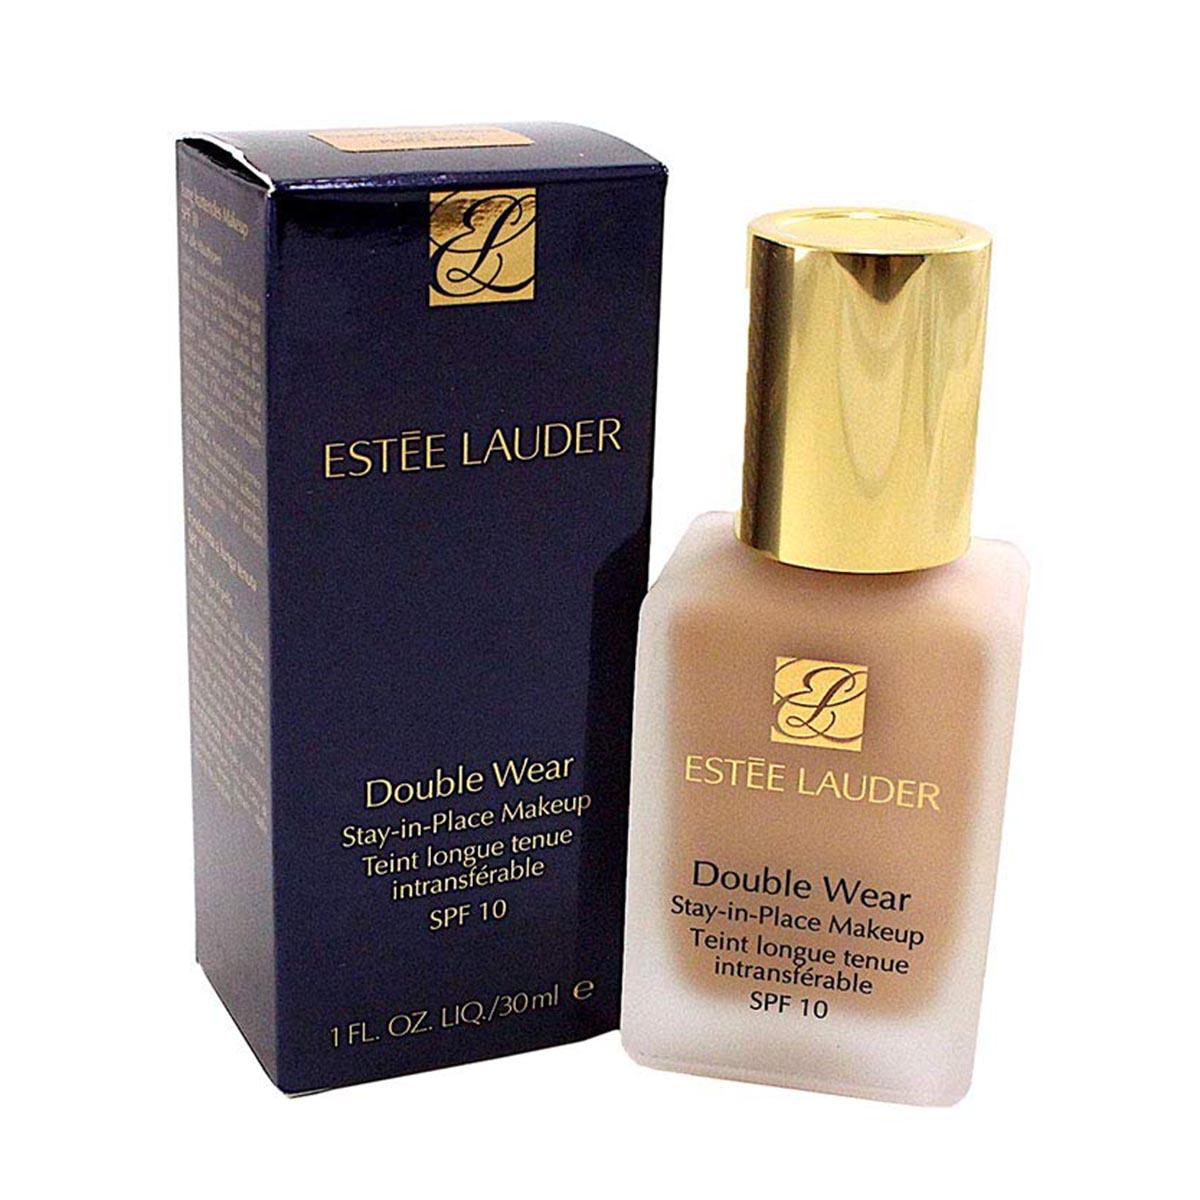 Estee lauder double wear stay in place makeup spf10 2c1 pure beige